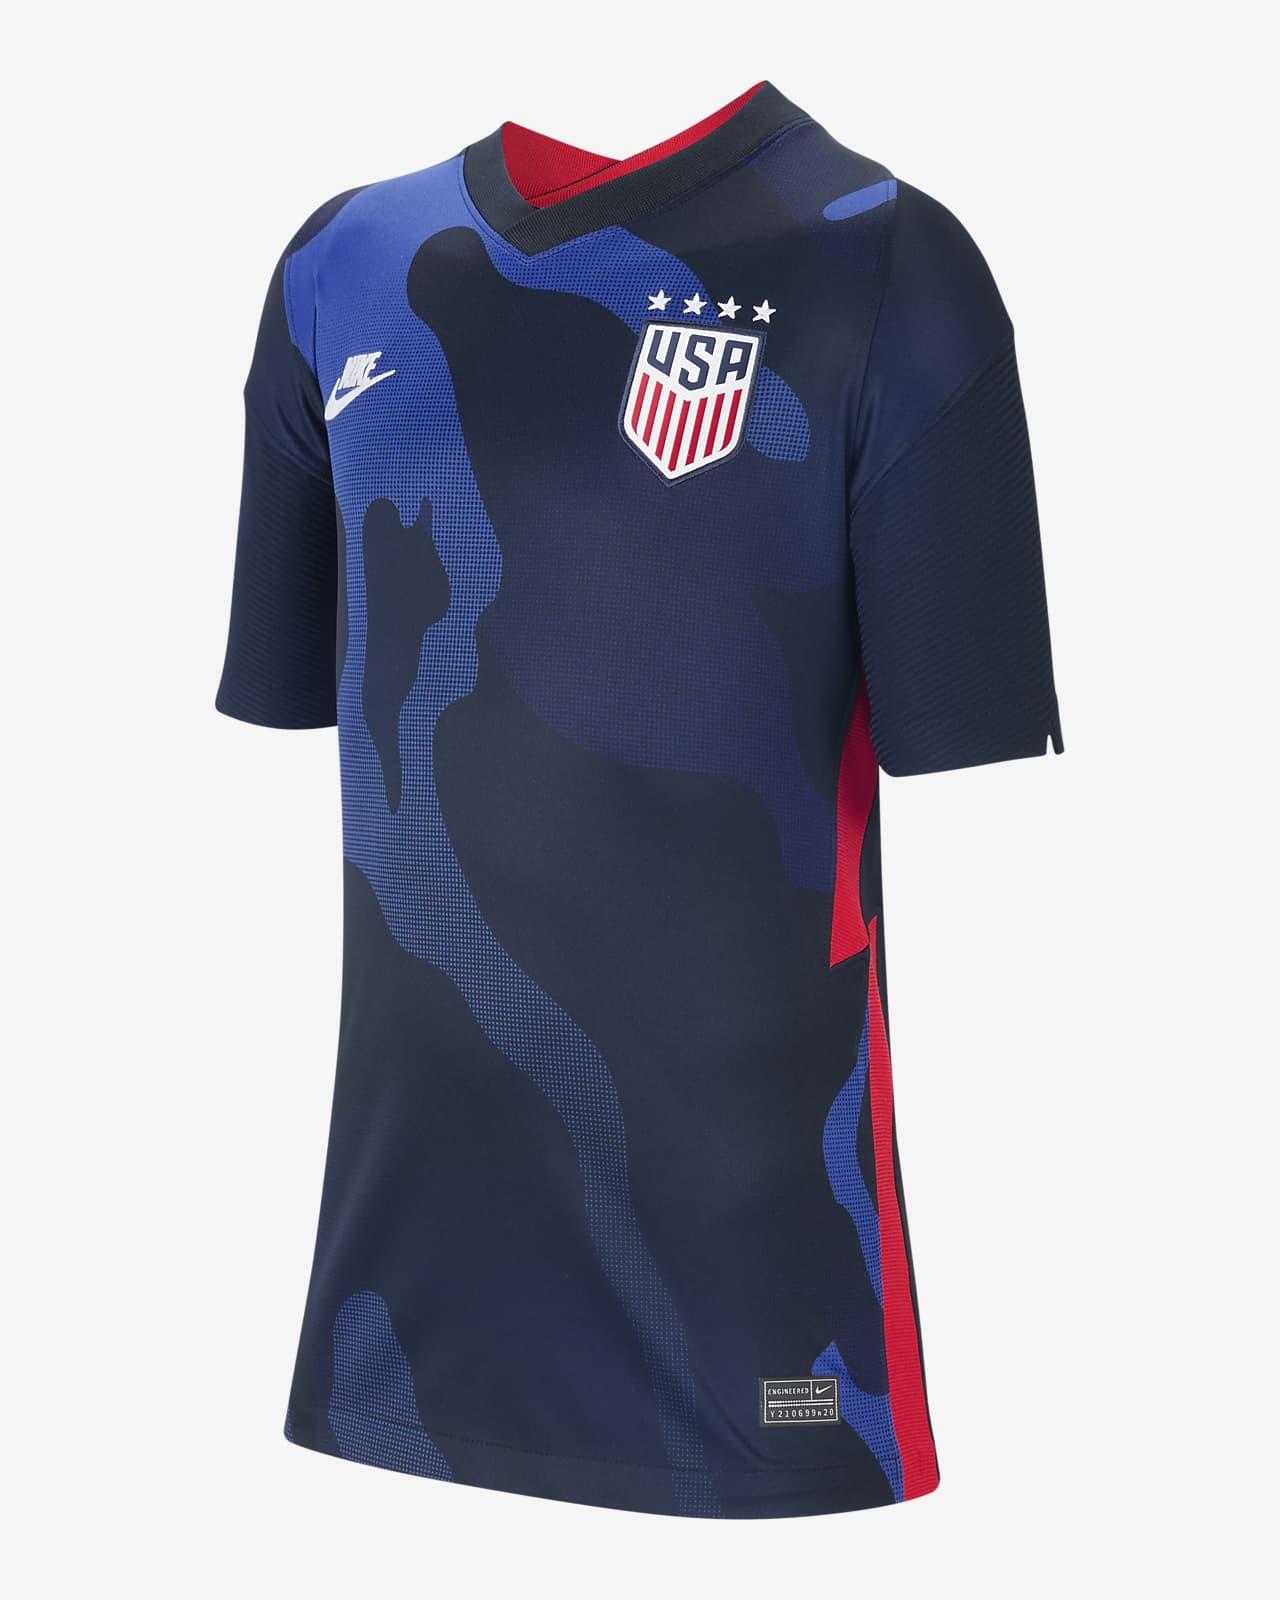 U.S. 2020 Stadium Away (4-Star) Big Kids' Soccer Jersey